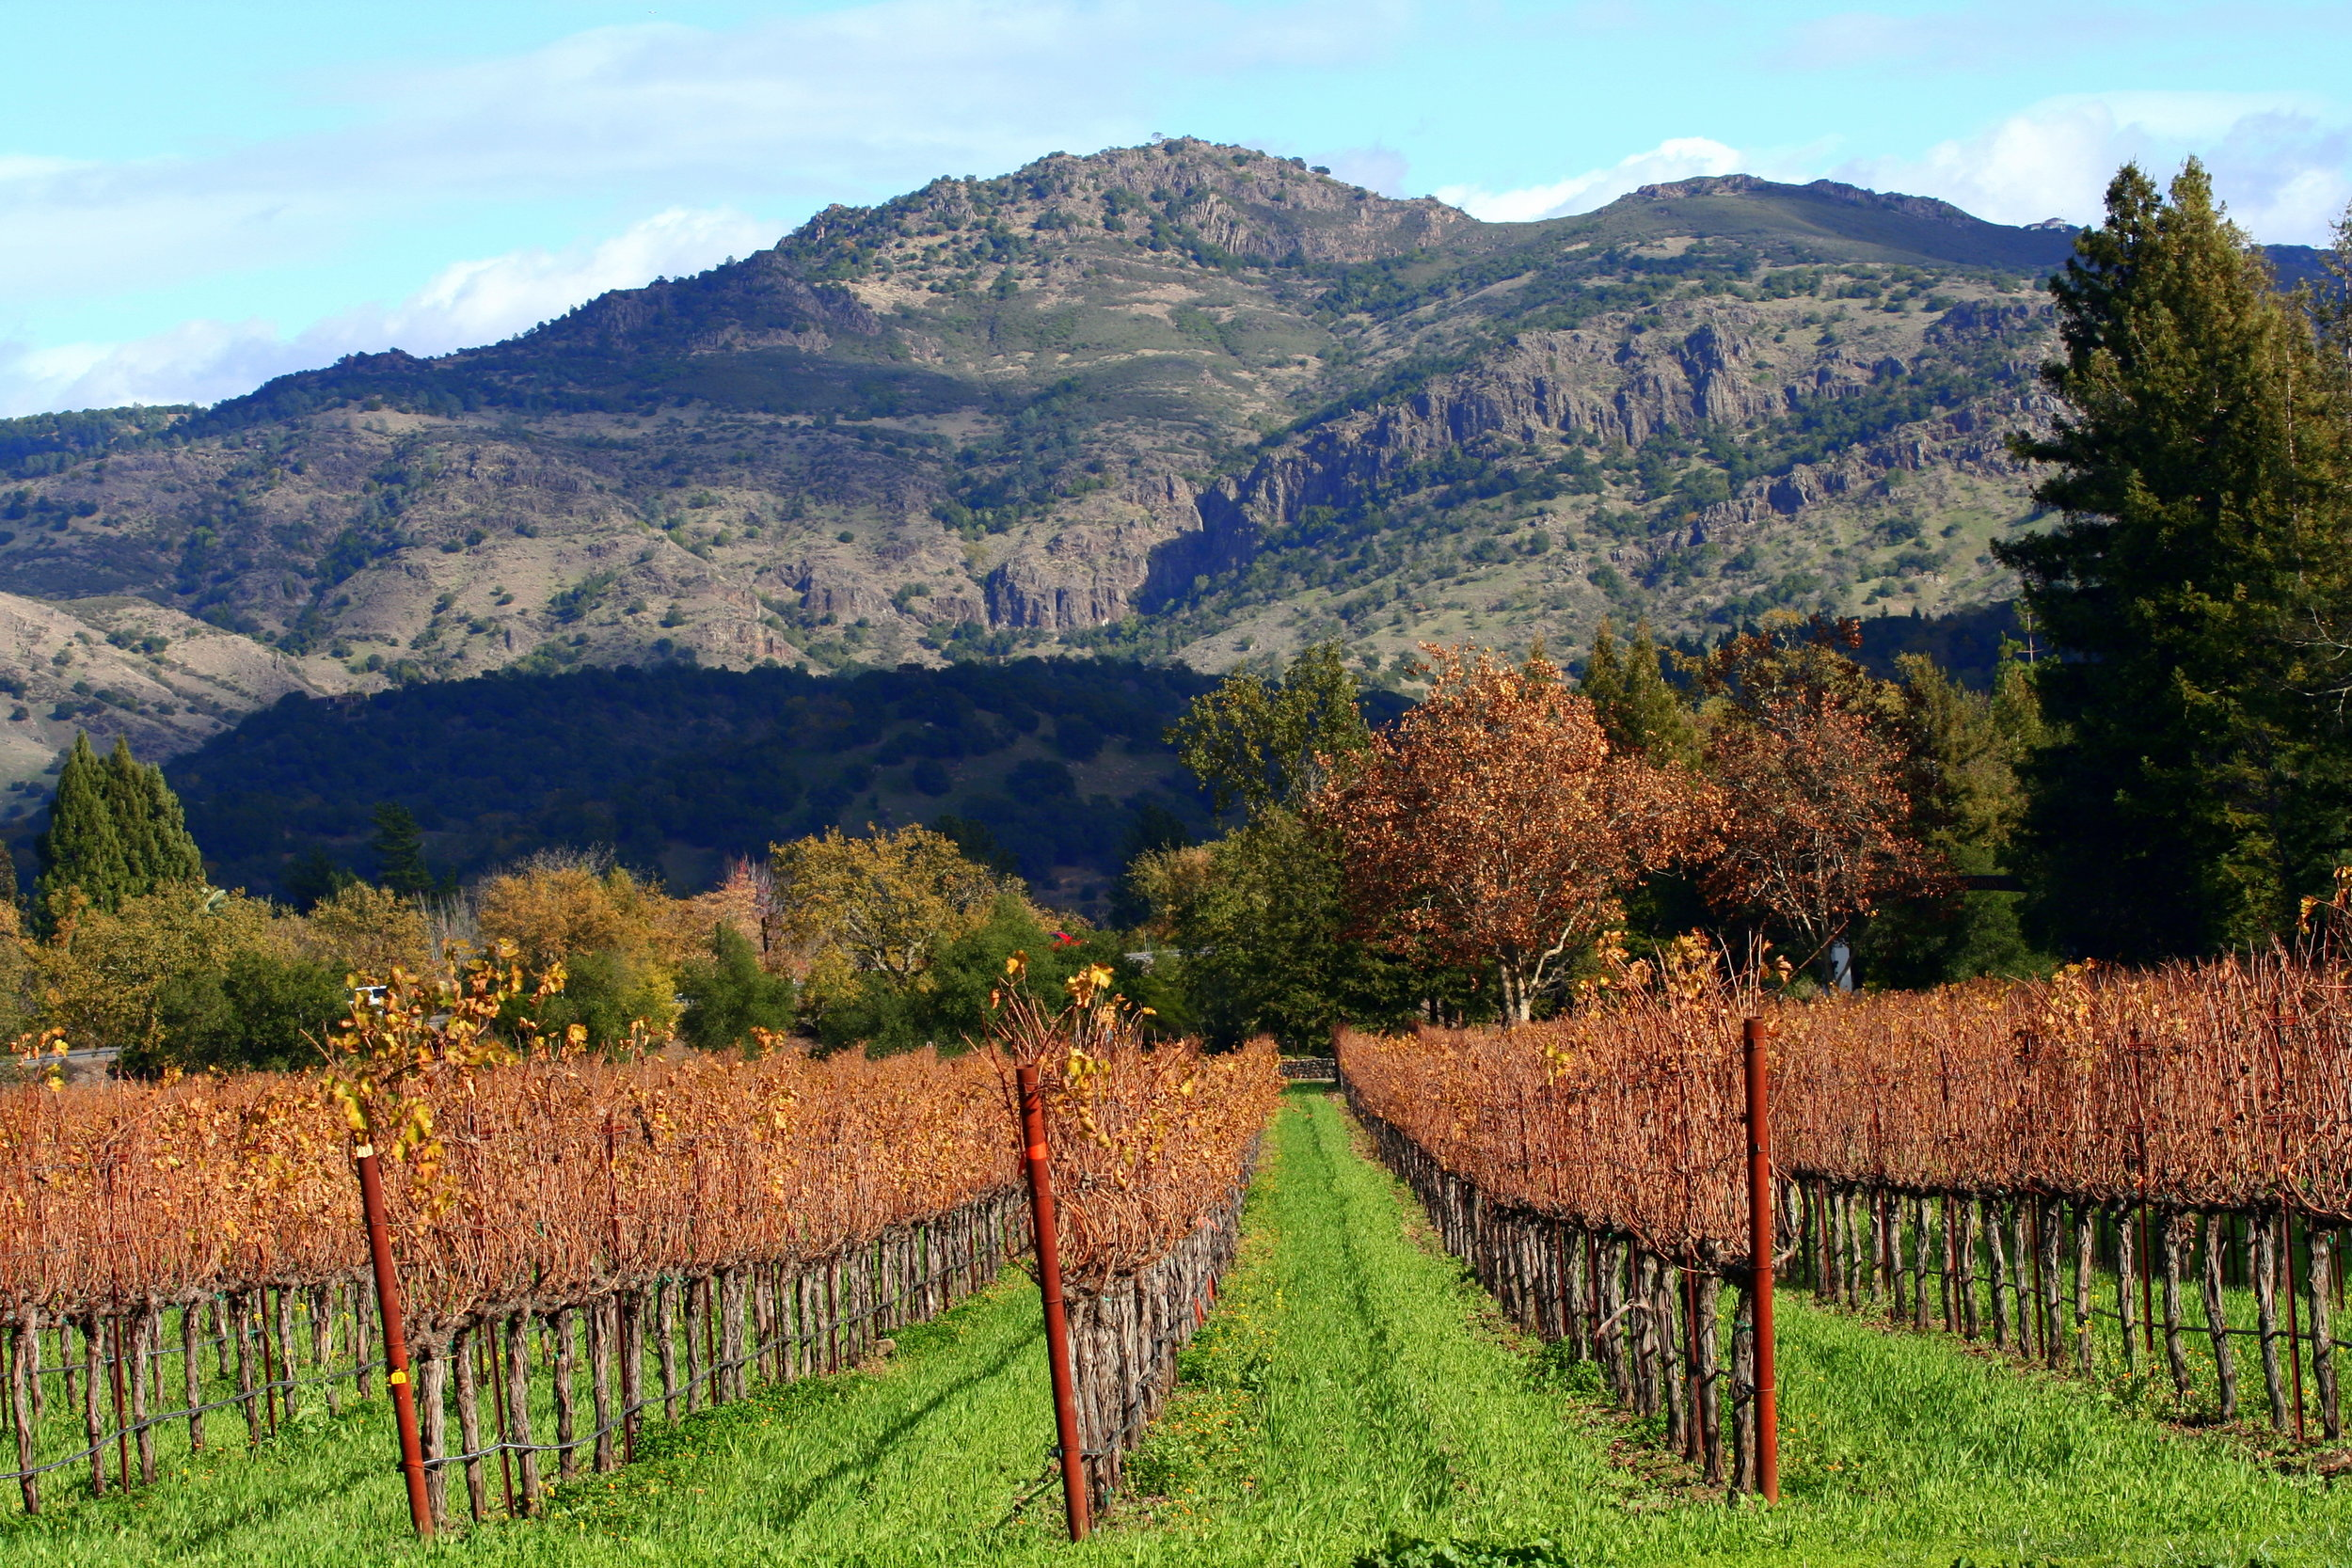 Autumn_in_Napa_Valley_vineyards.jpg